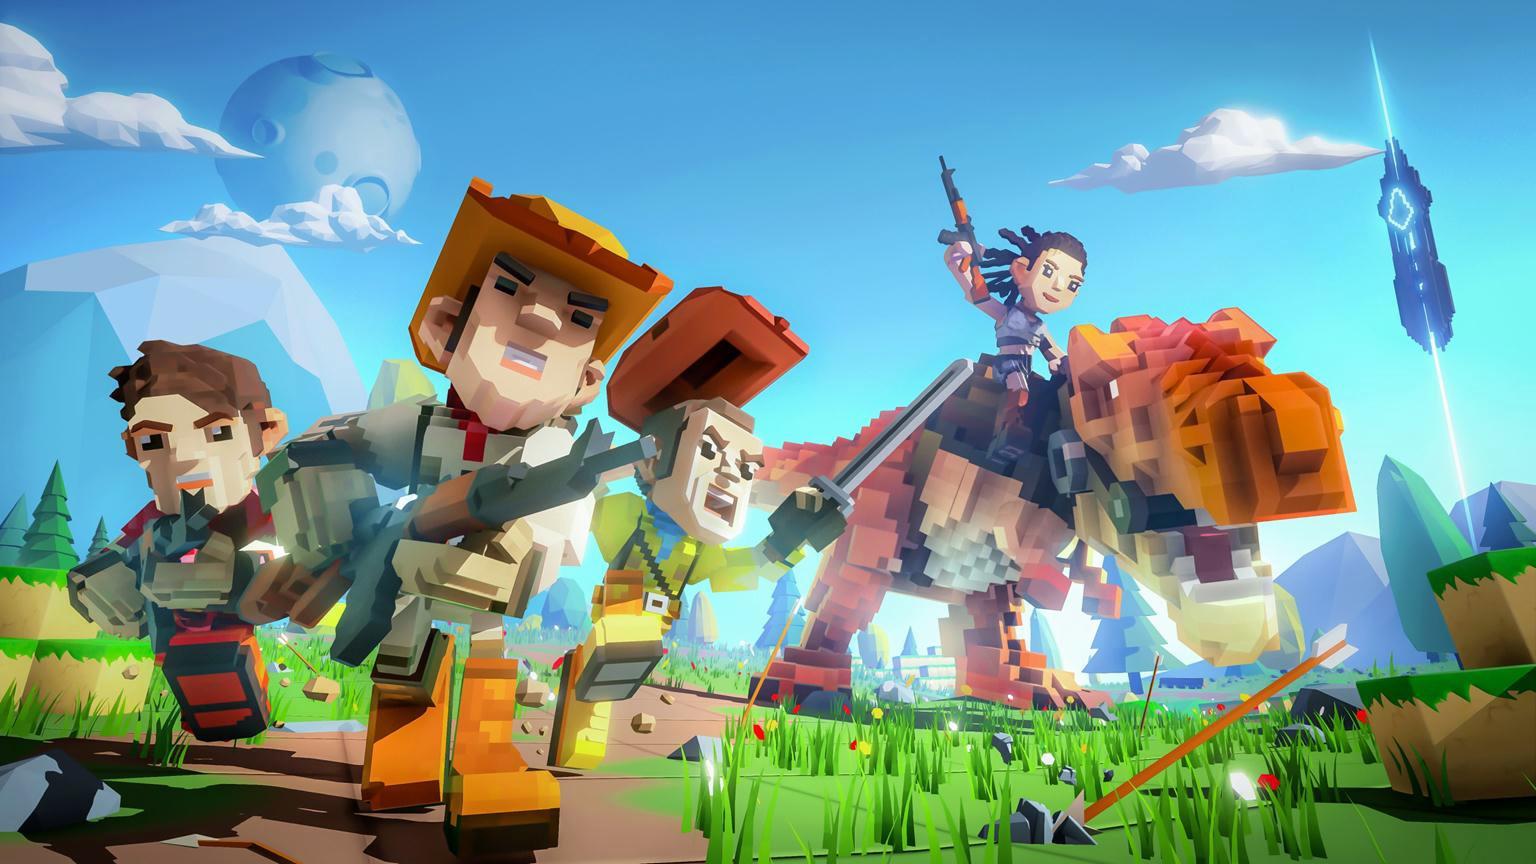 Open World Sandbox Survival Game PixArk Announced For PS4